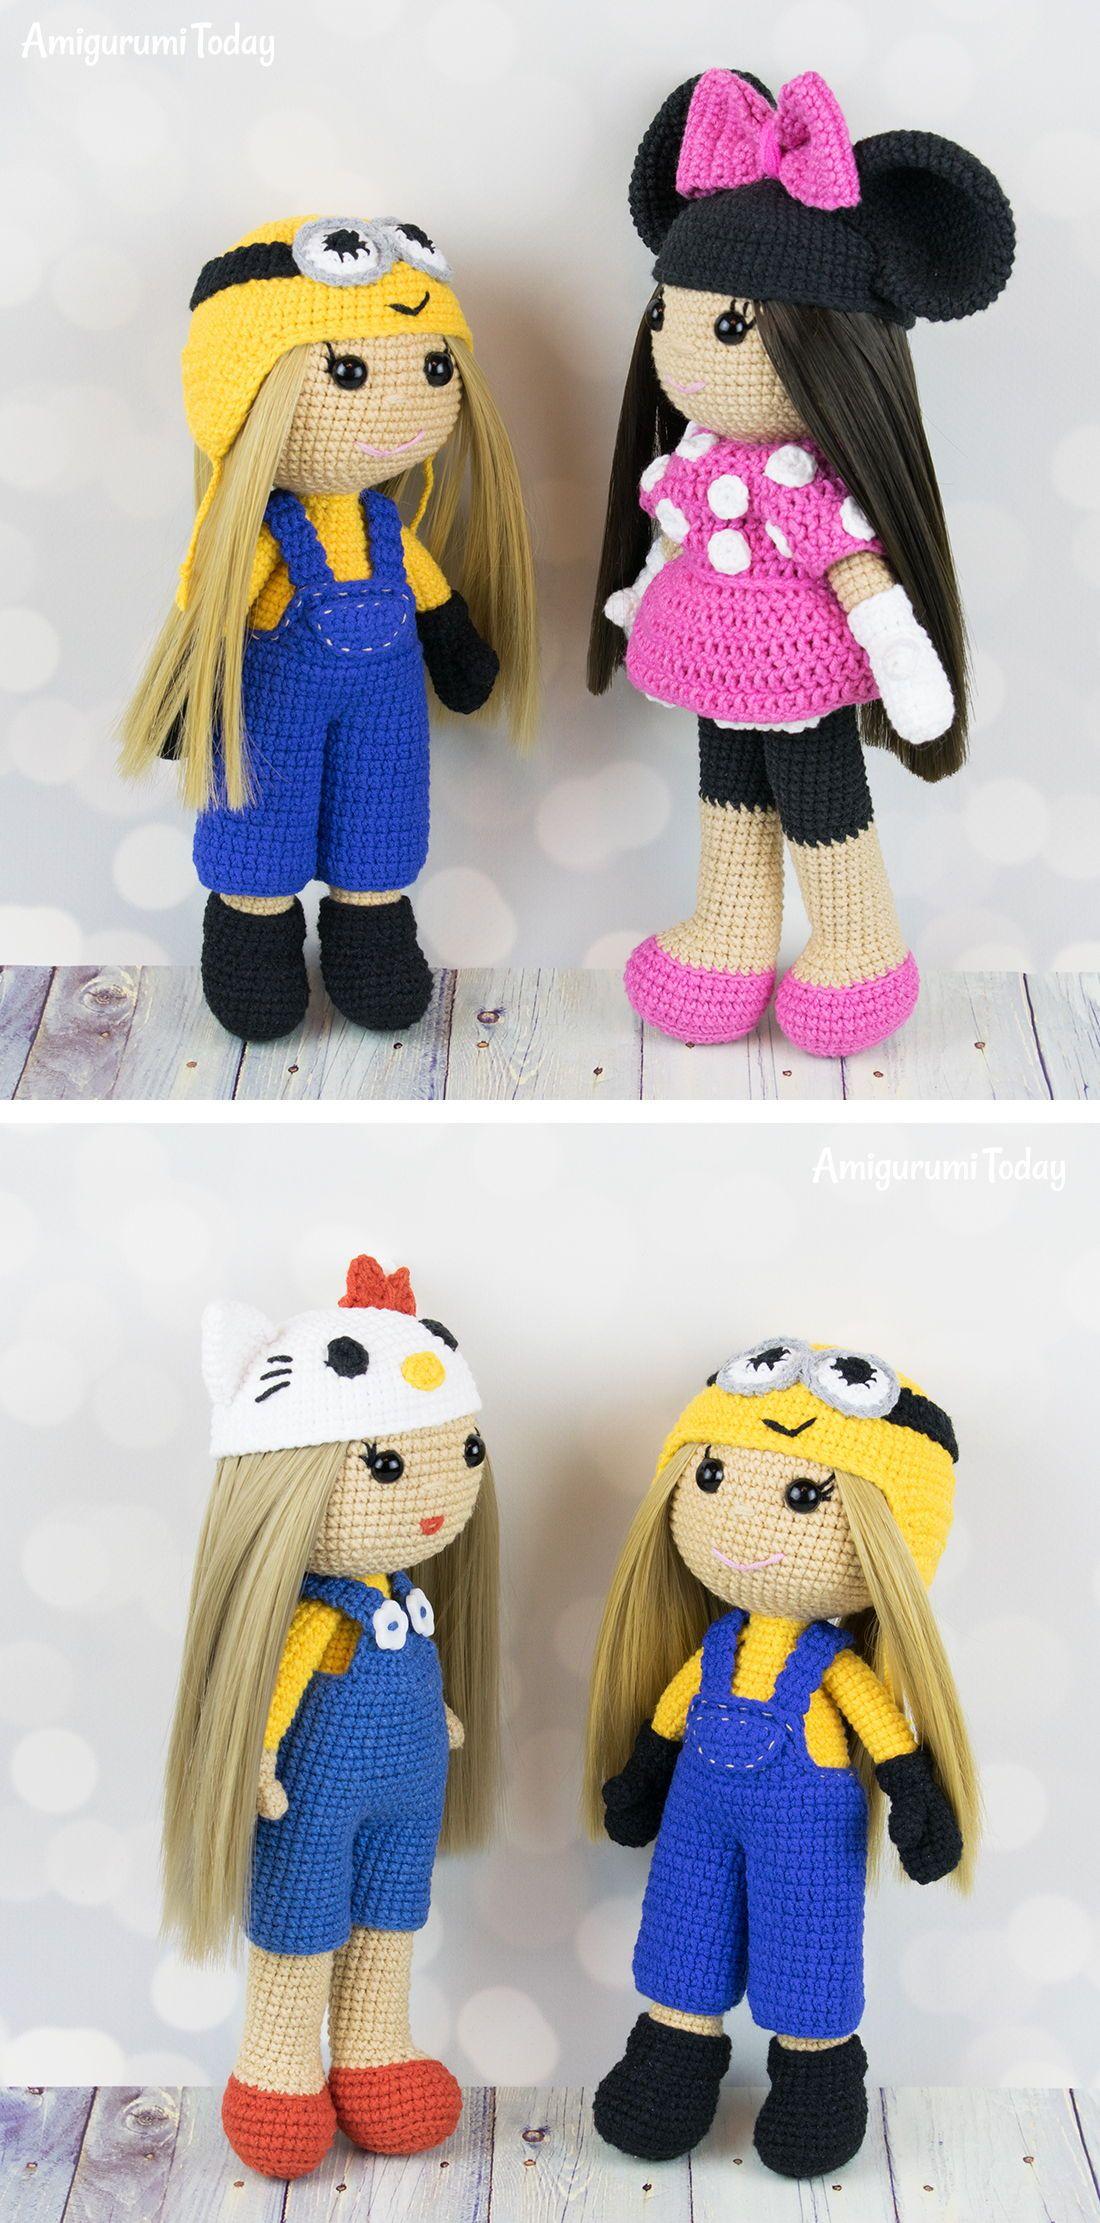 Crochet doll in Minnie Mouse costume | Pinterest | Häkeln